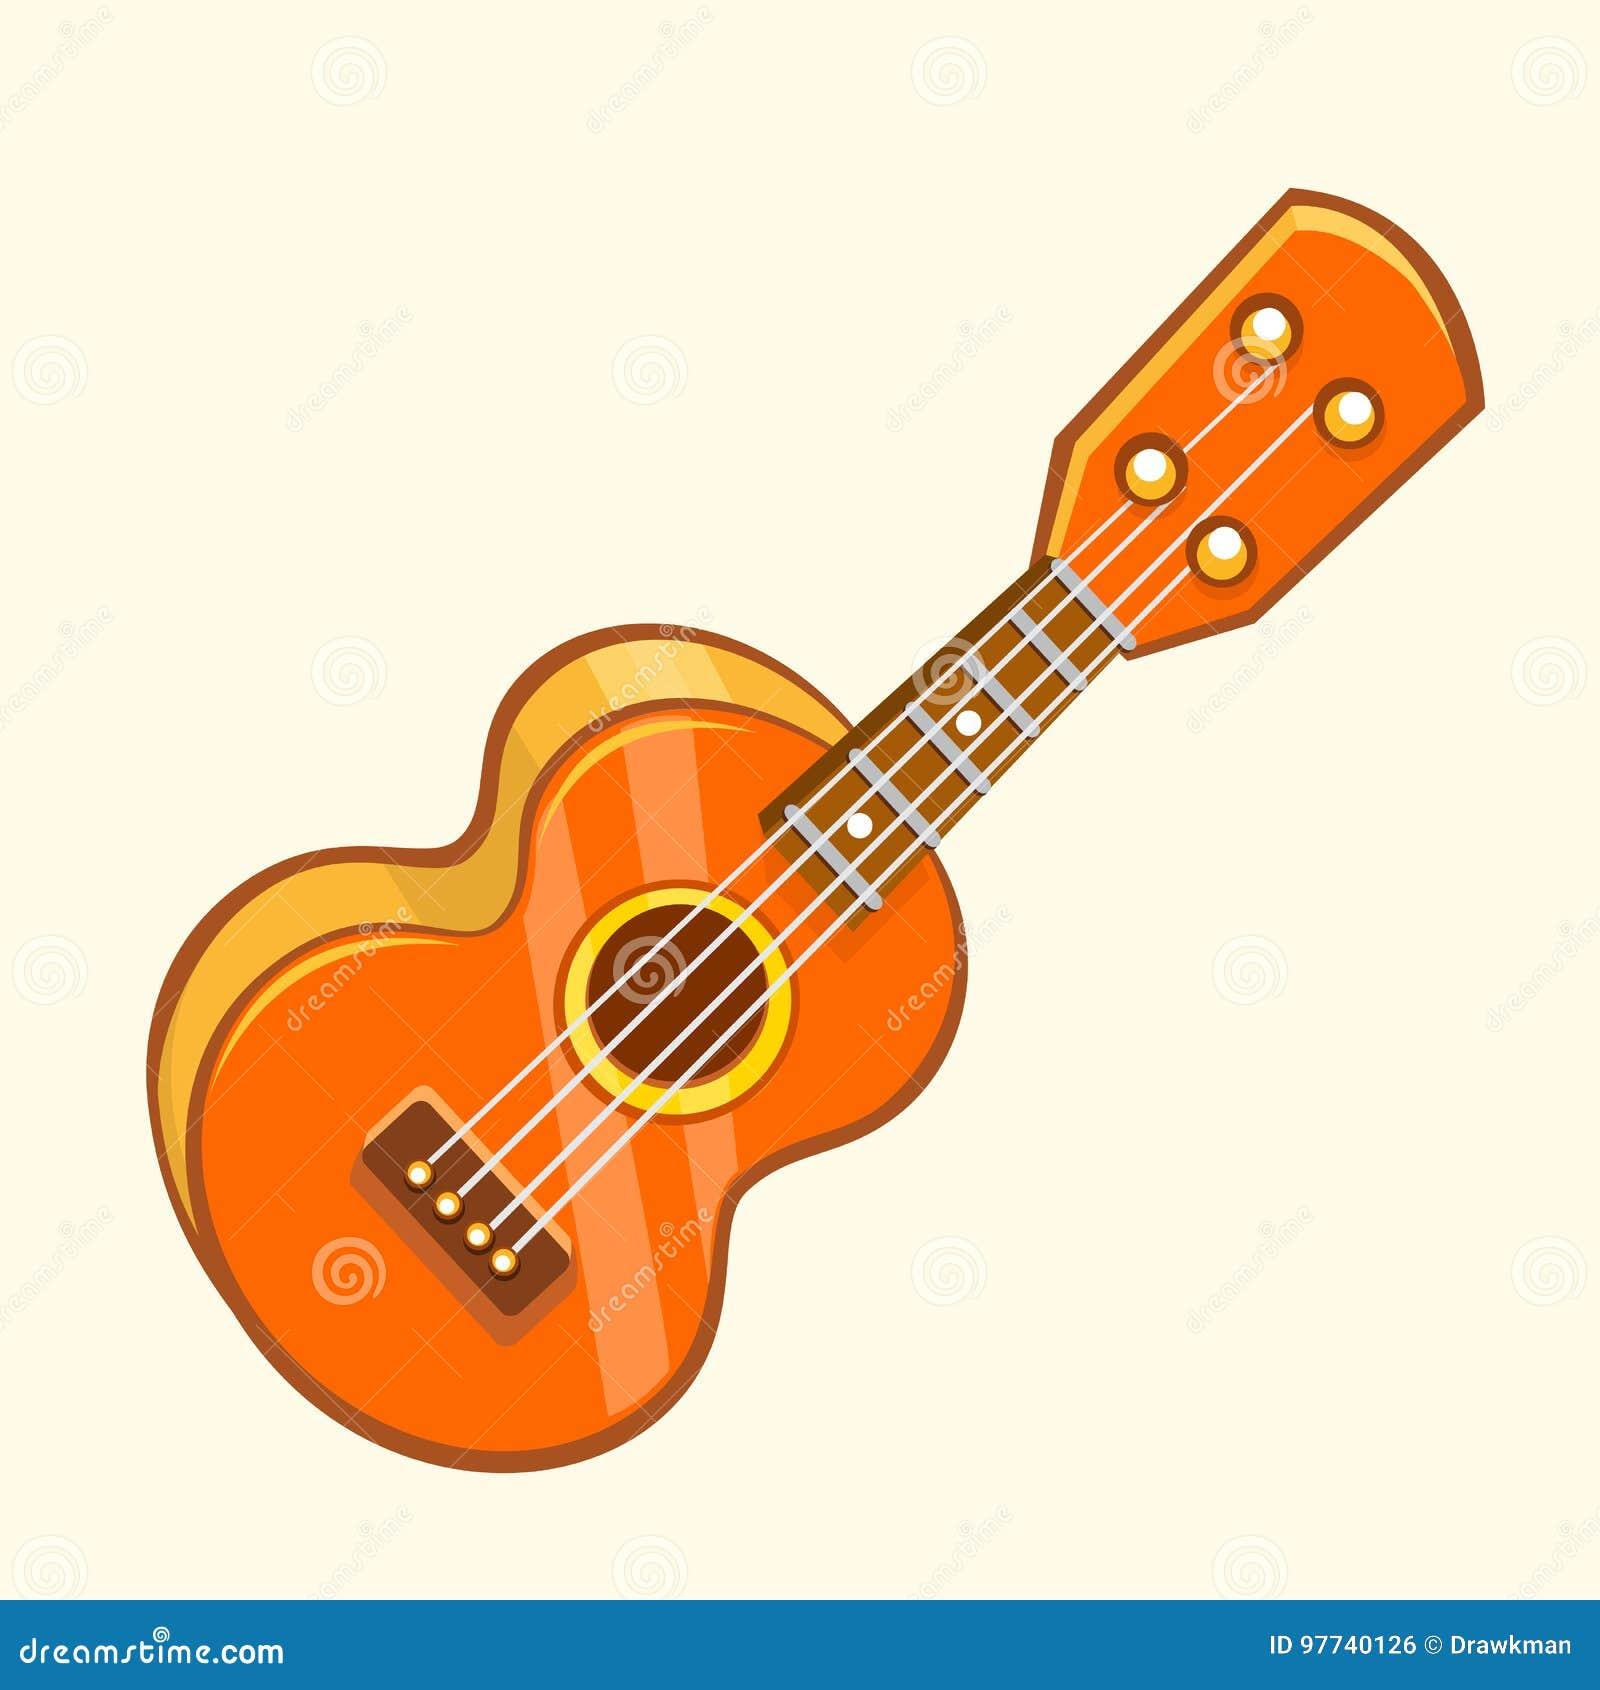 cartoon vector illustration of acoustic guitar or ukulele cartoon rh dreamstime com instrument clip art gif instrumental clip art